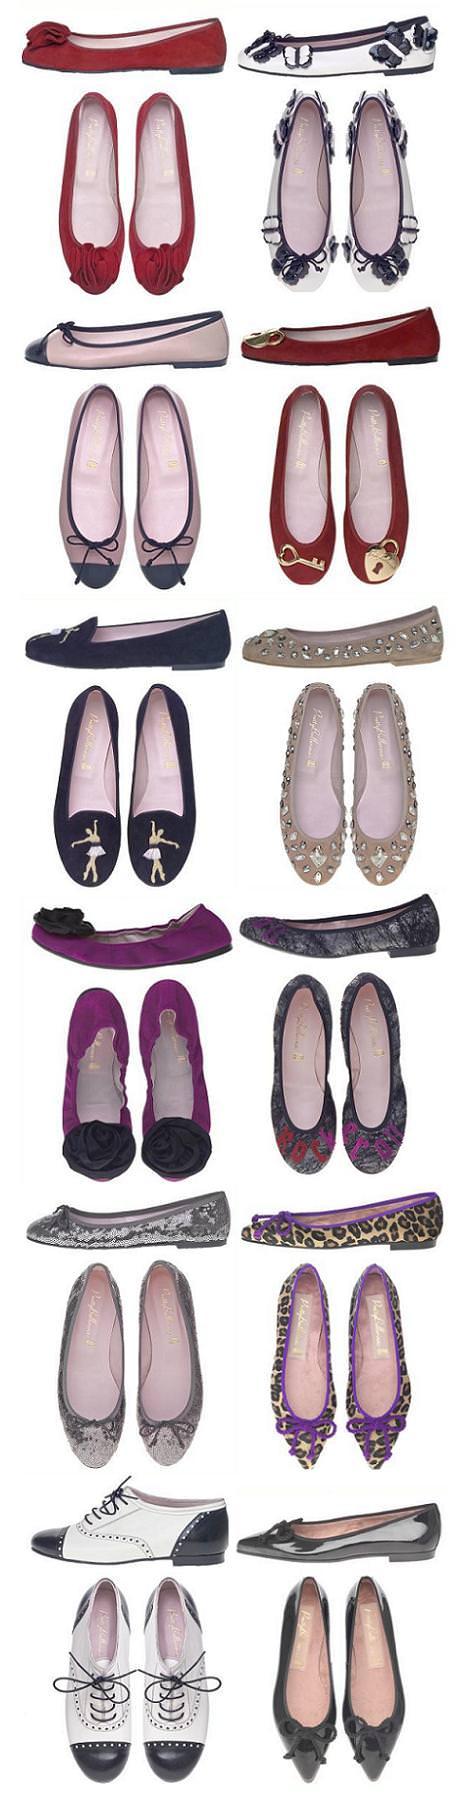 Pretty Bailarinas otoño invierno 2010 2011